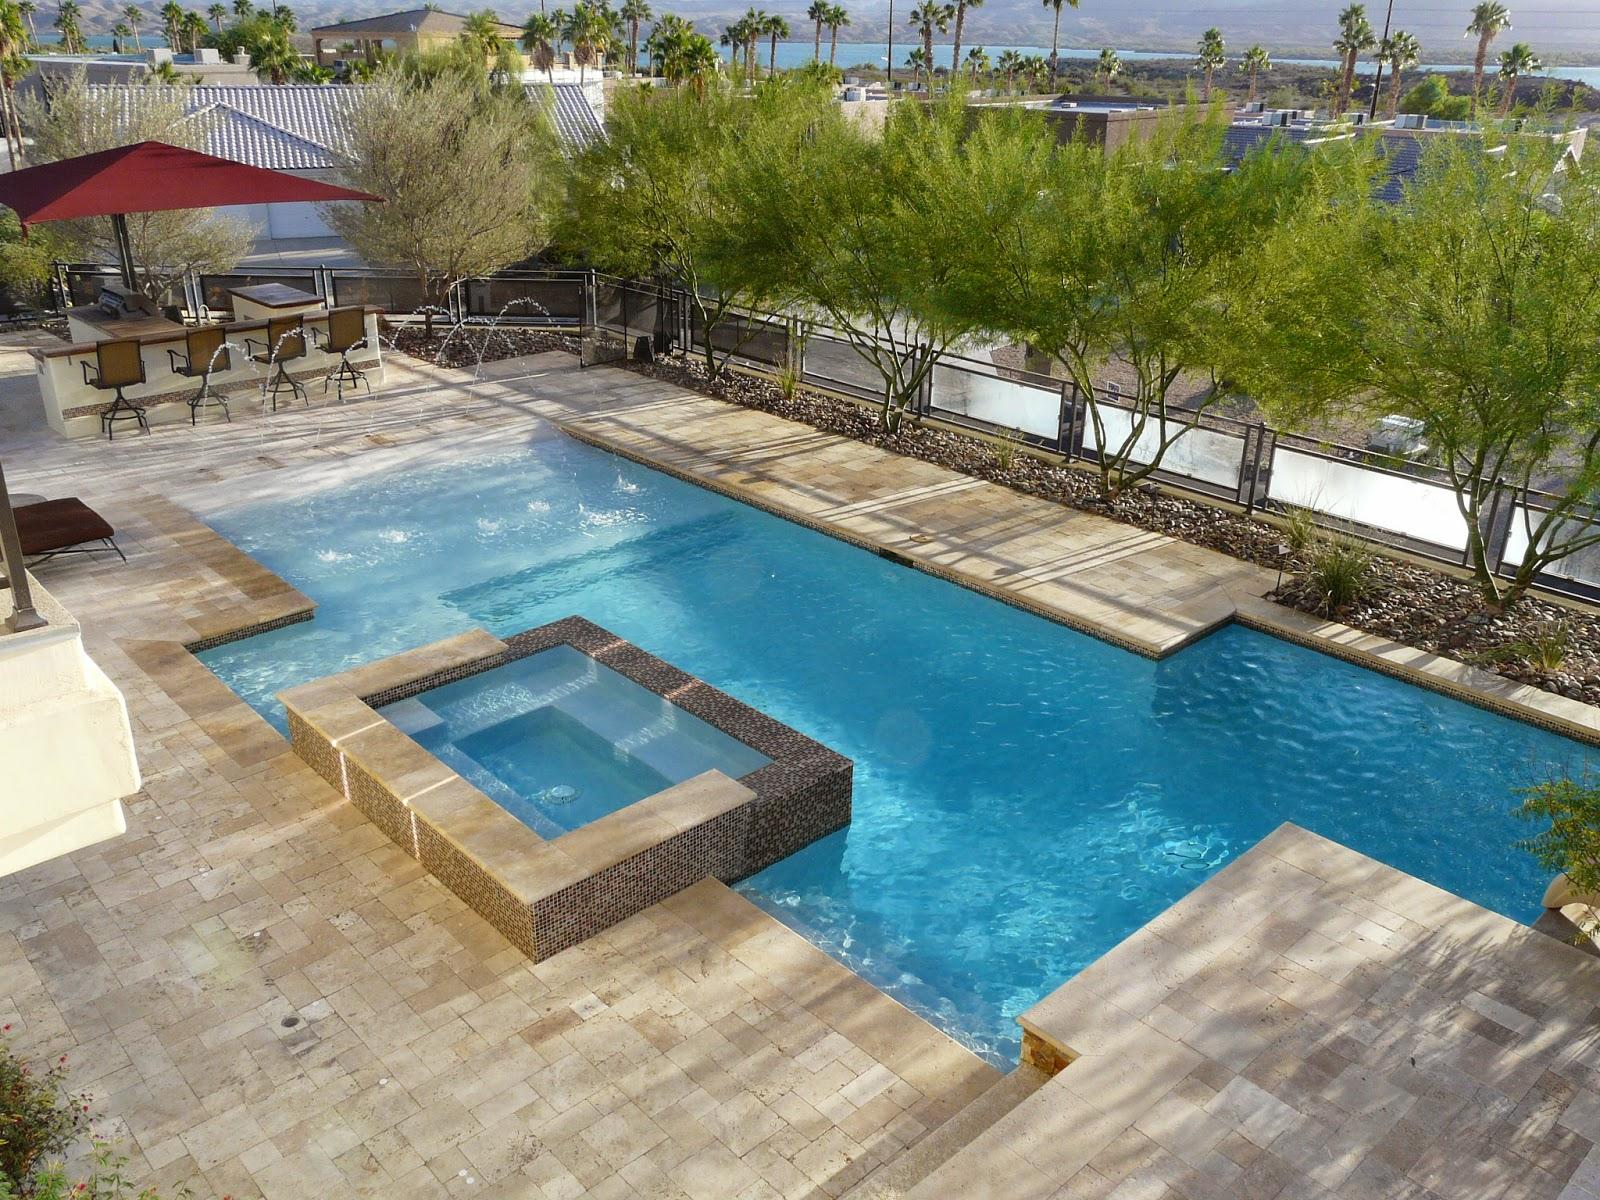 Swimming Pools In EL Paso TX: Find Stunning Swimming Pool ...